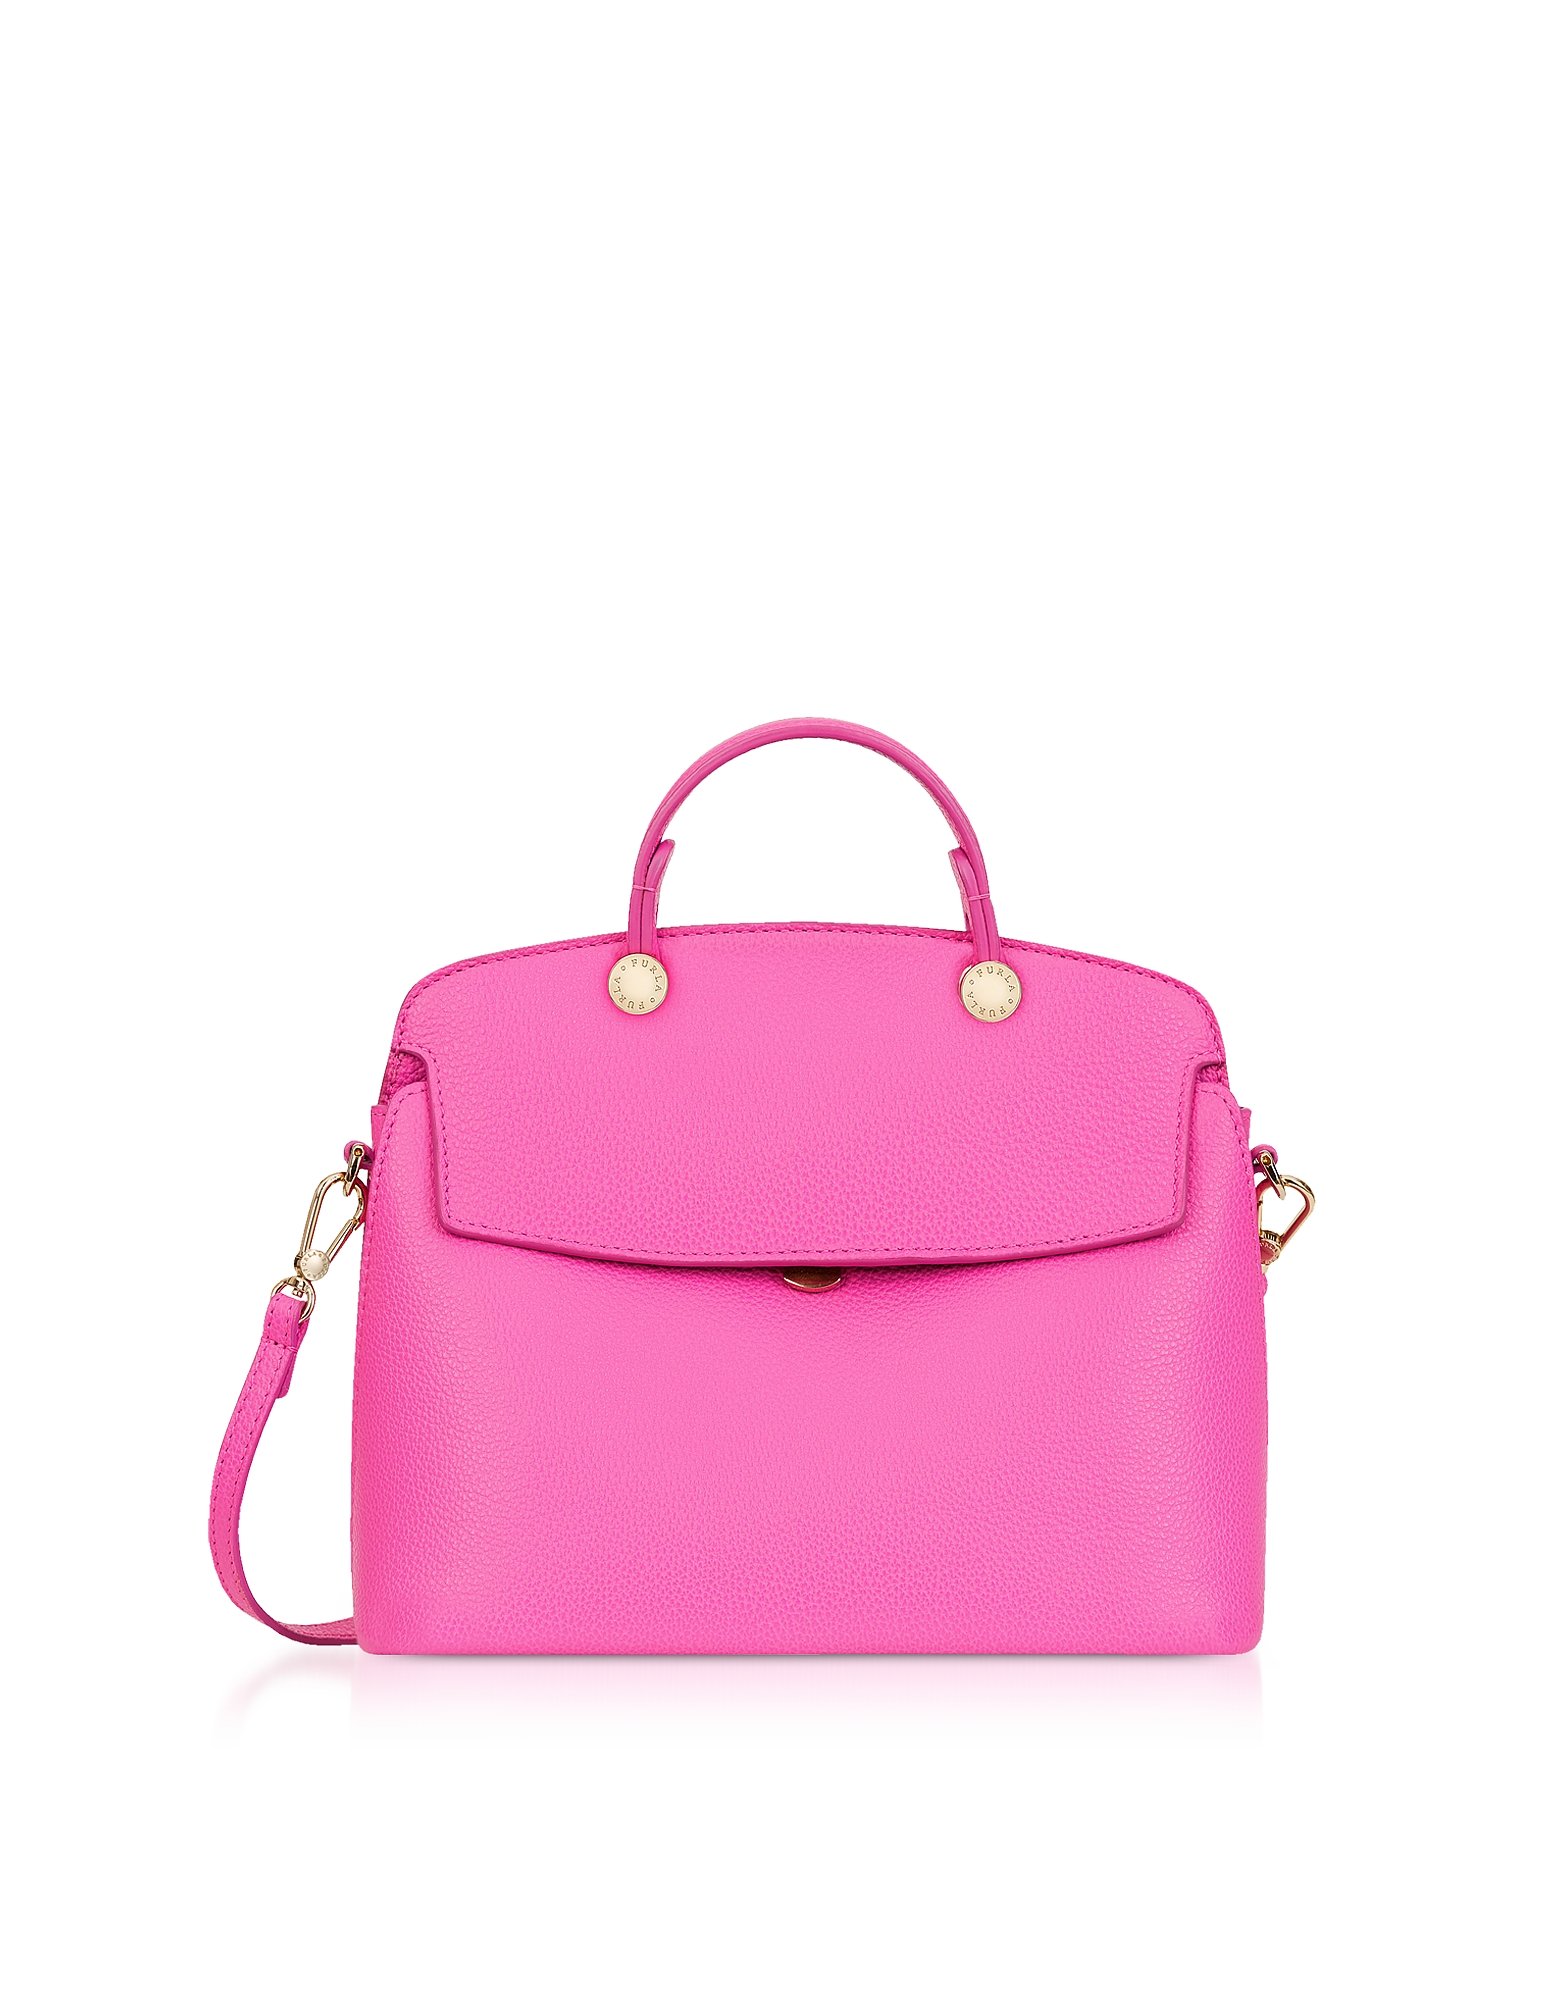 Furla Handbags, Fuchsia Leather My Piper Small Satchel Bag